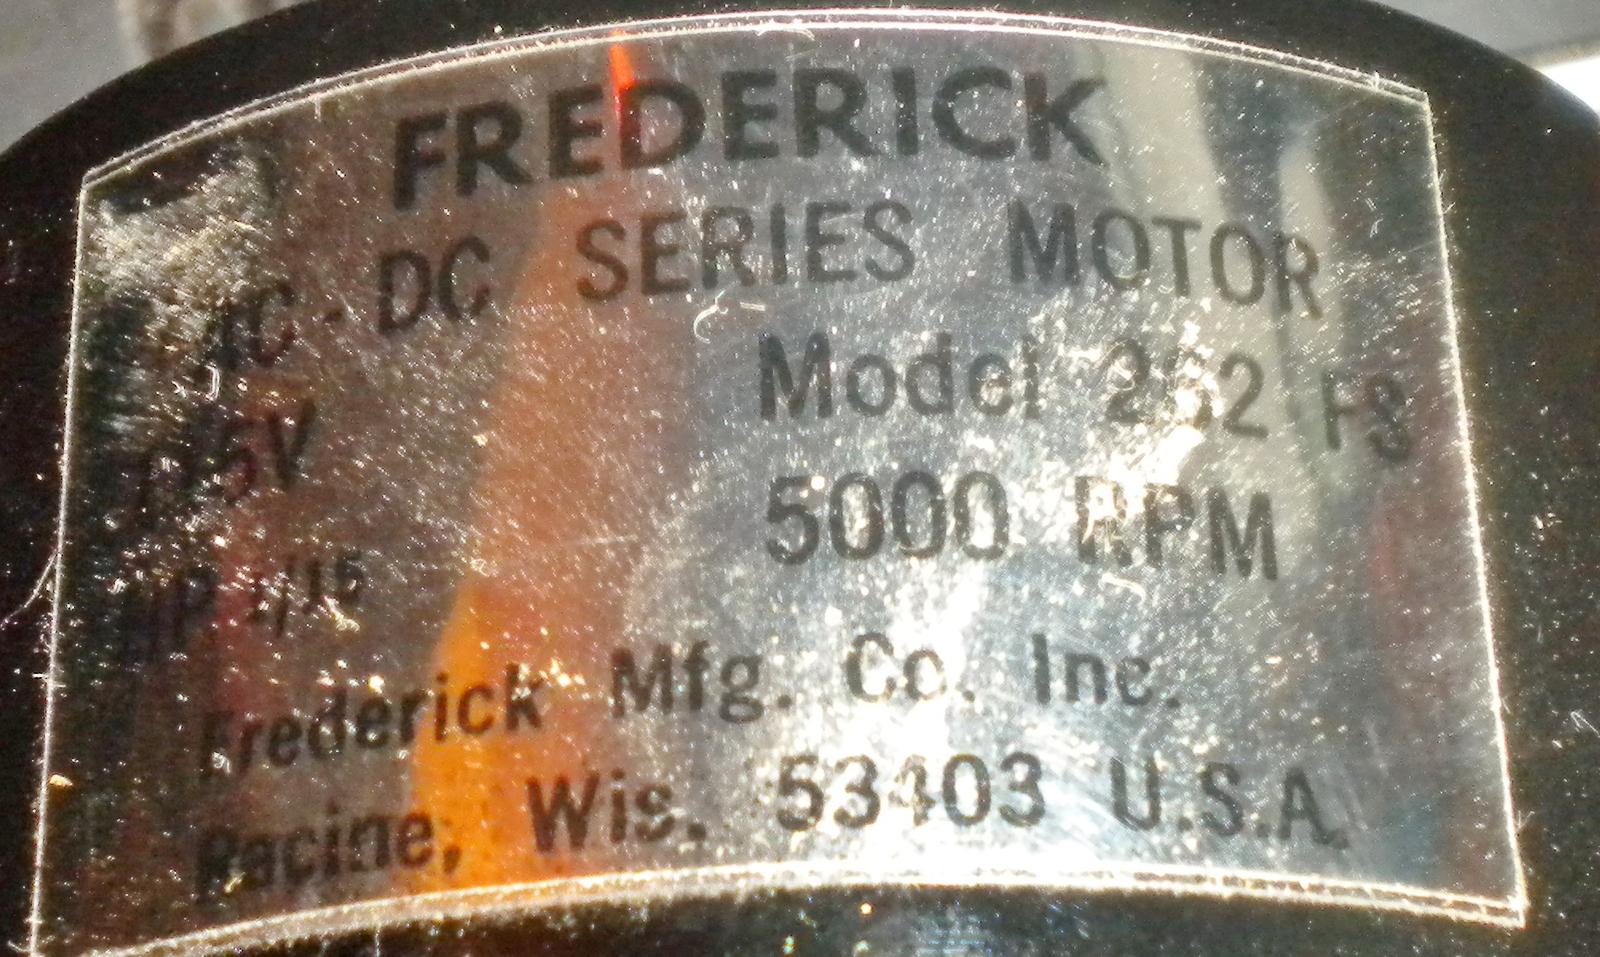 Frederick Sewing Machine Motor Kit #2X420 NOS Motor, Pedal, Belt & Duplex Plug image 4